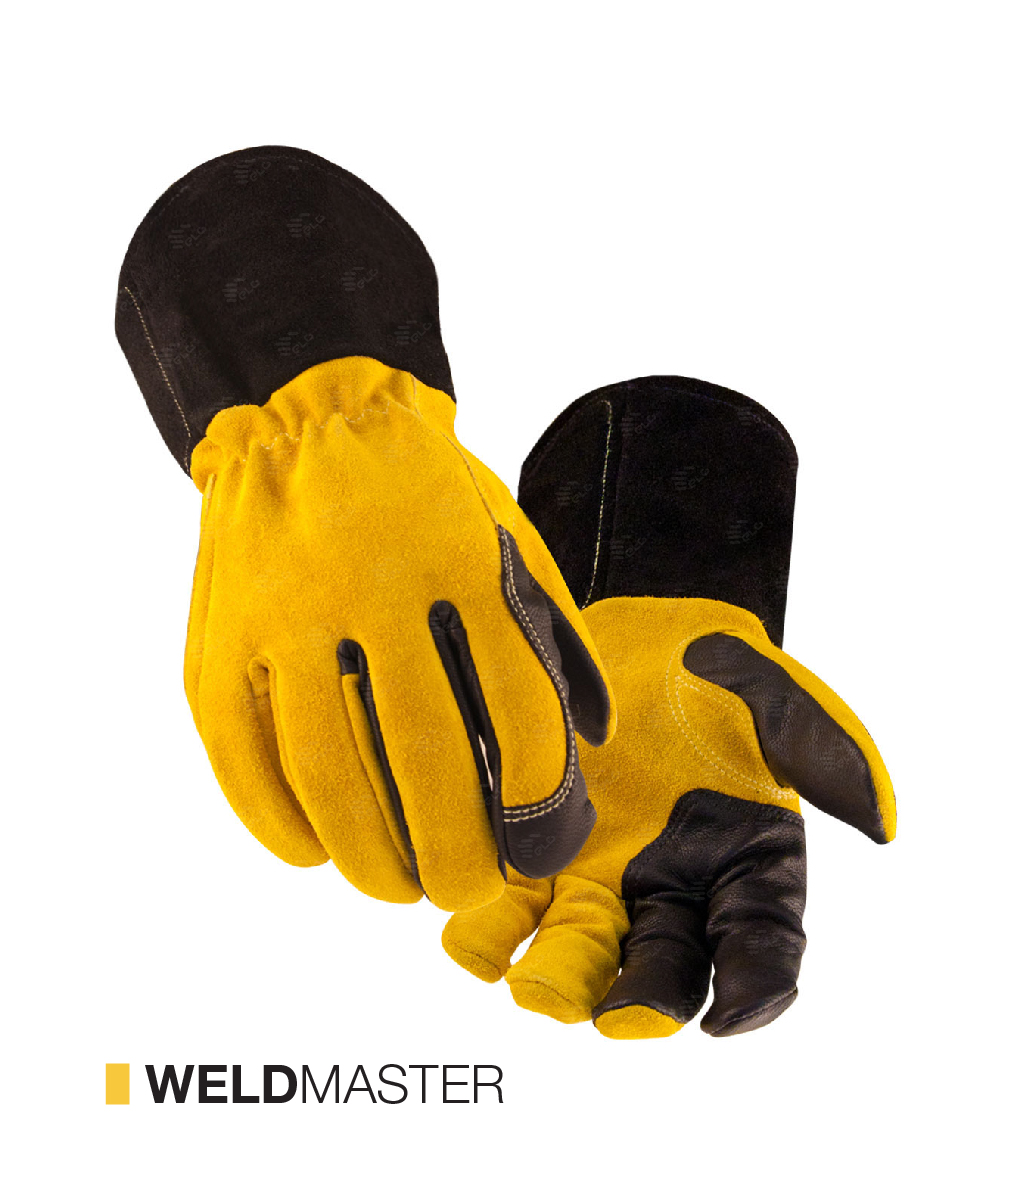 WELDMASTER cut-resistant gloves by elite leather